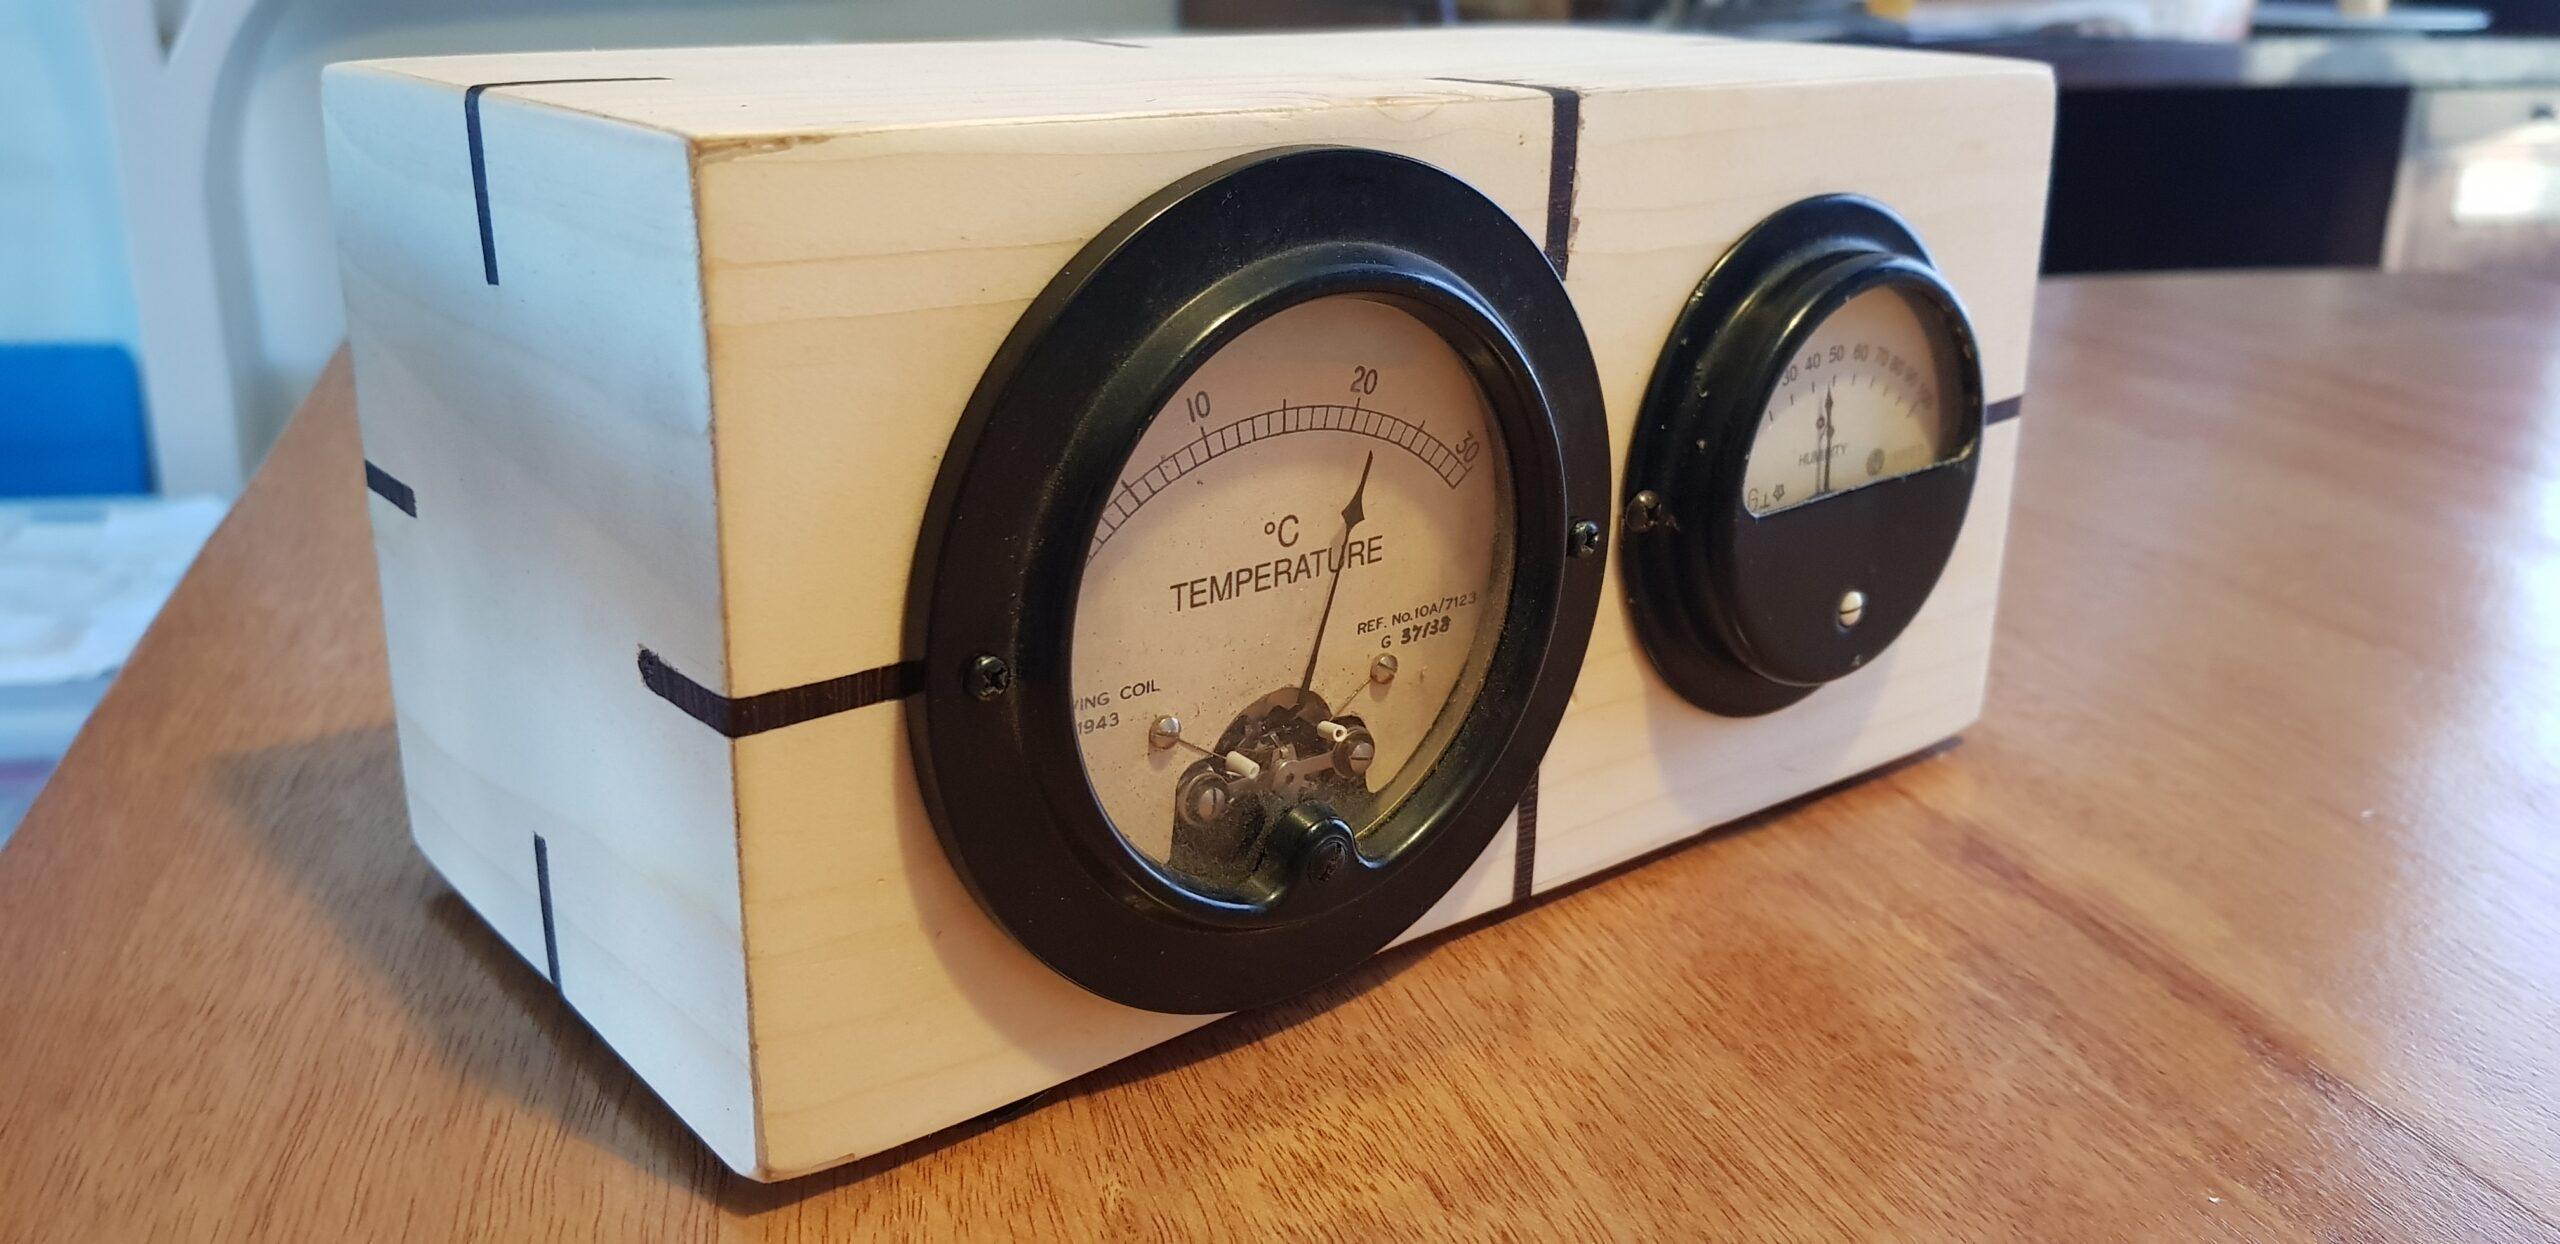 Temperature Humidty Meter Box